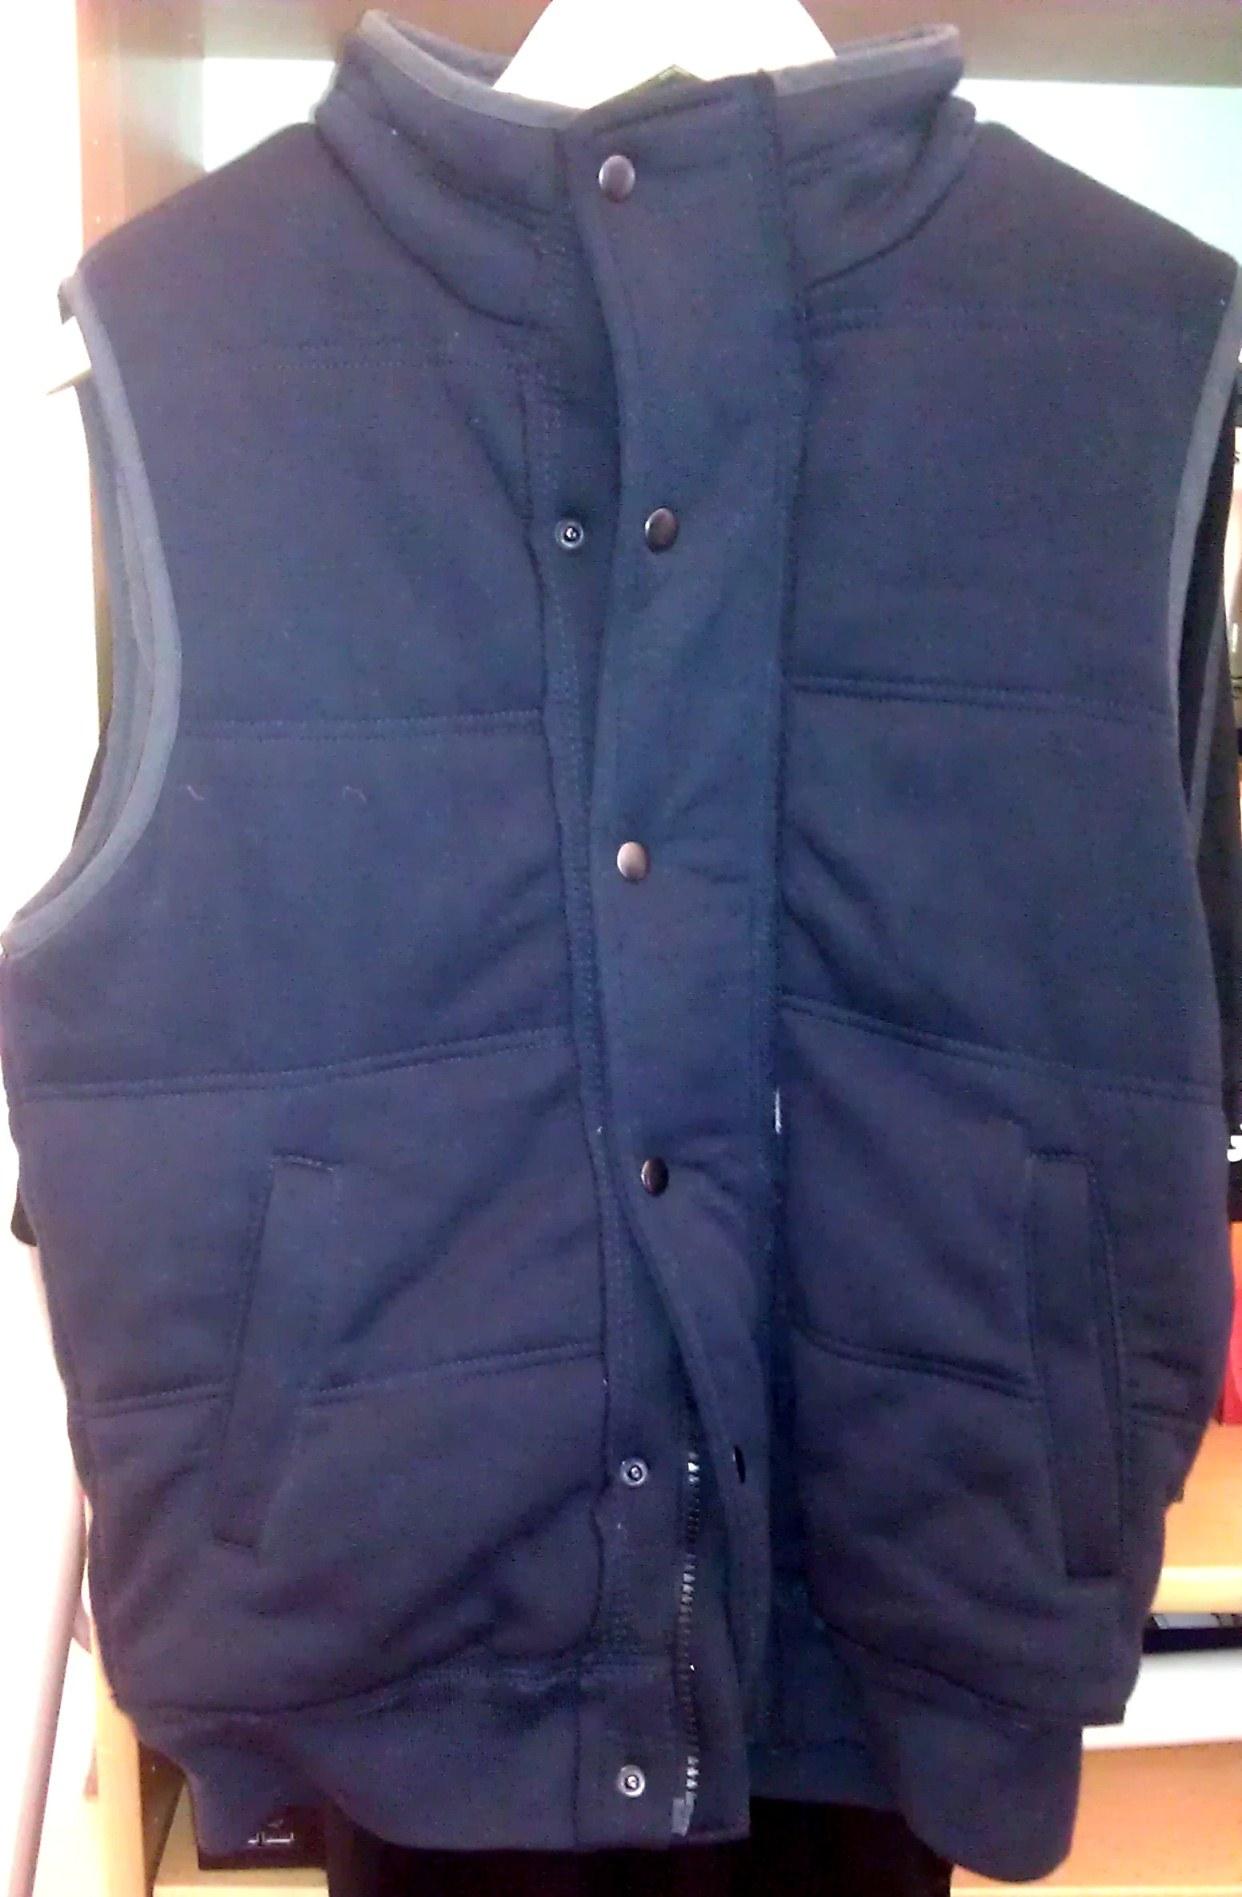 Kostymtest  The Tailoring Club  e18ceeca175b0